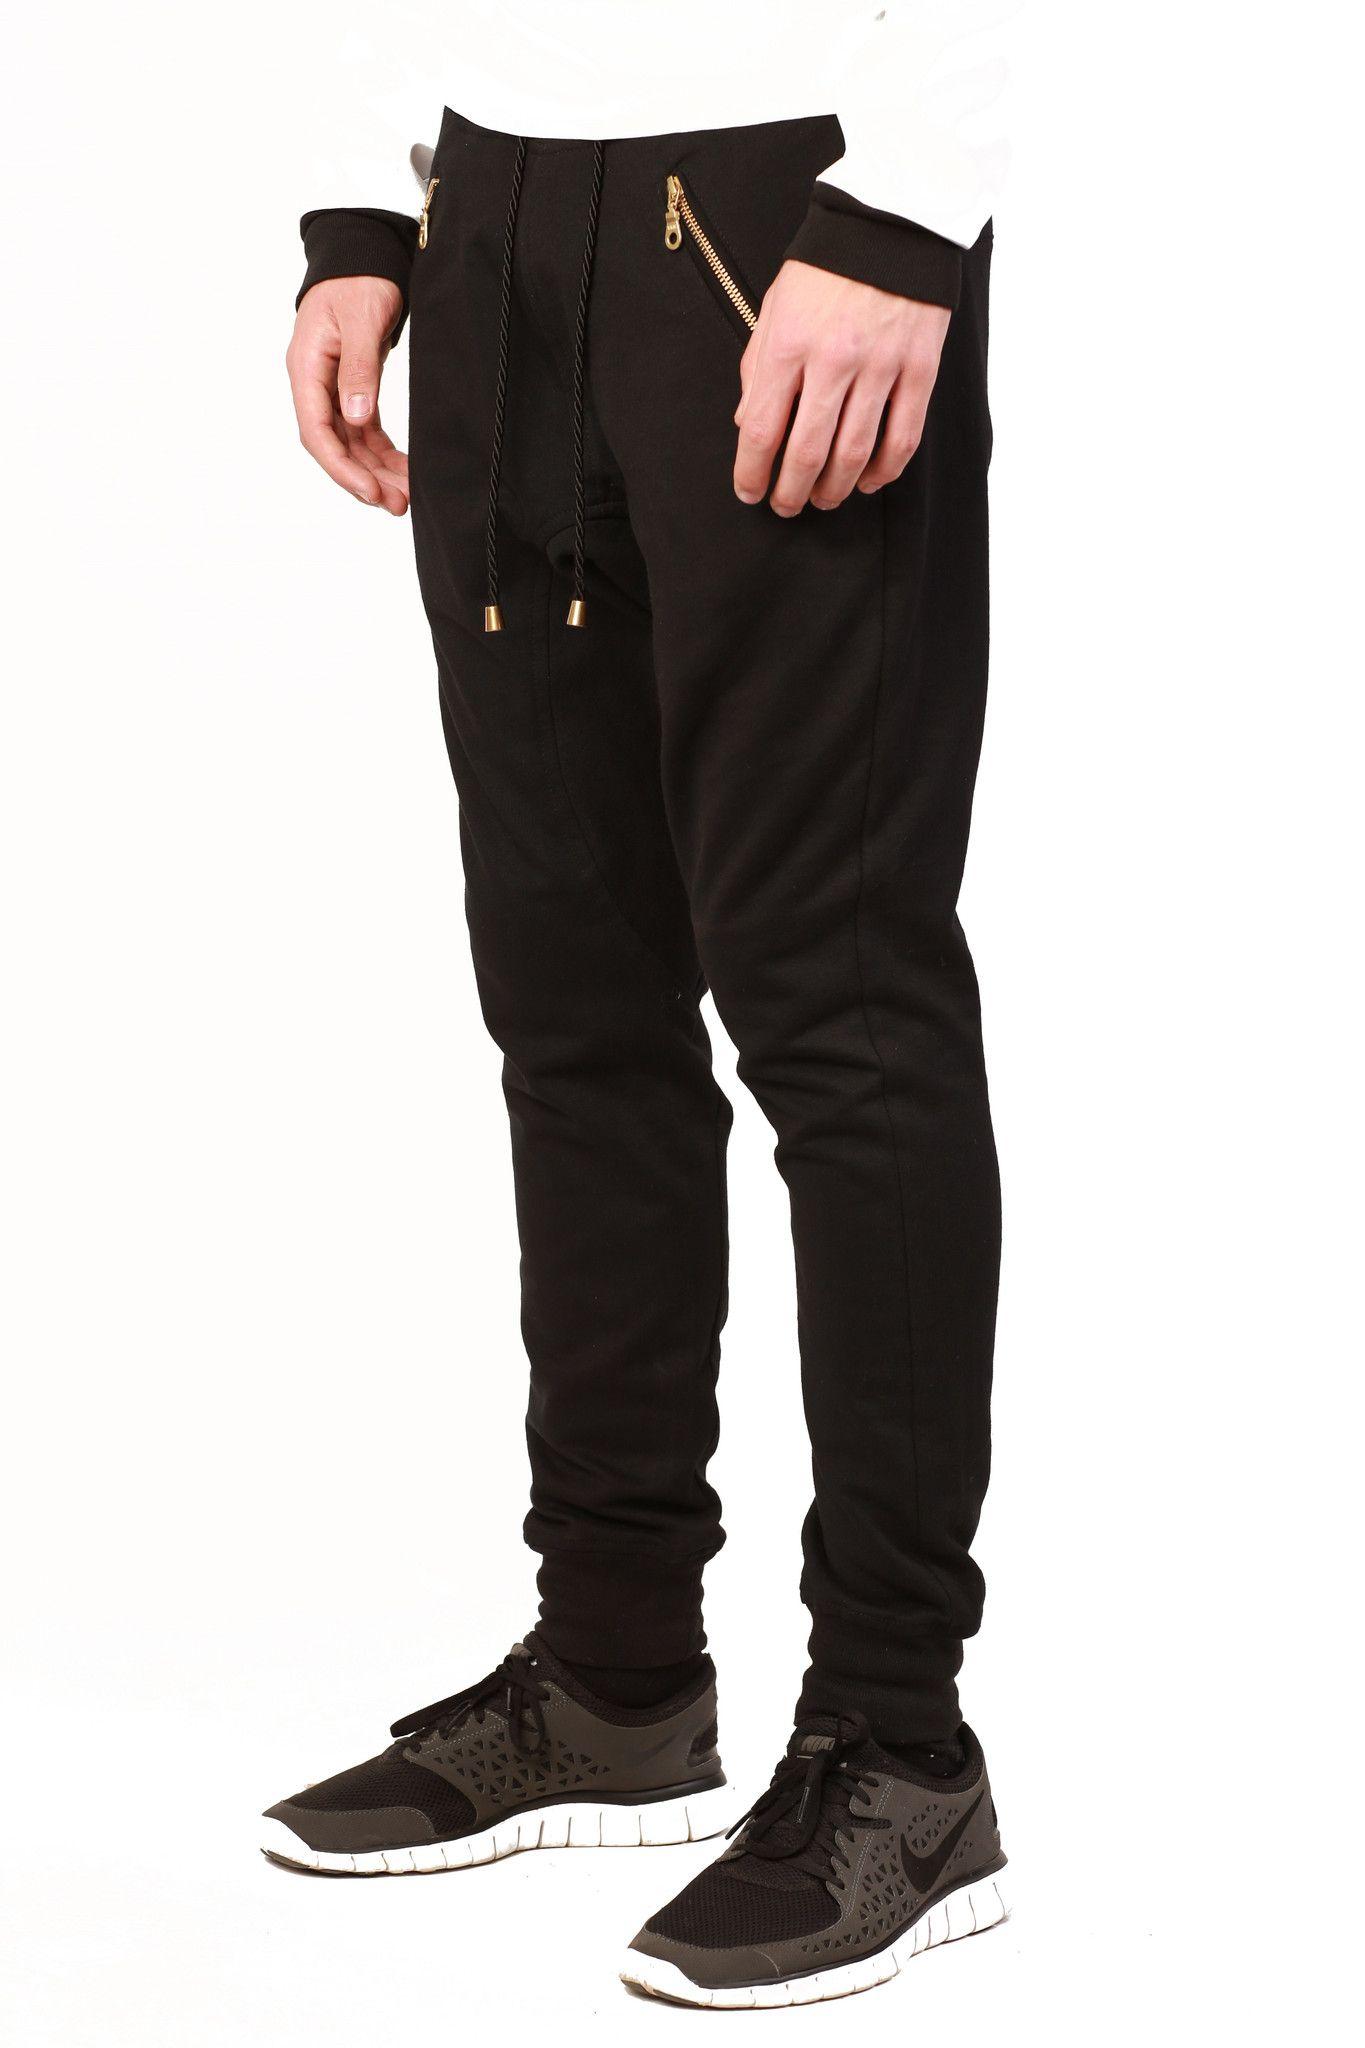 VMU LONDON - Black Joggers - £70.00   Pants, Shorts and Belts ... d188a38117